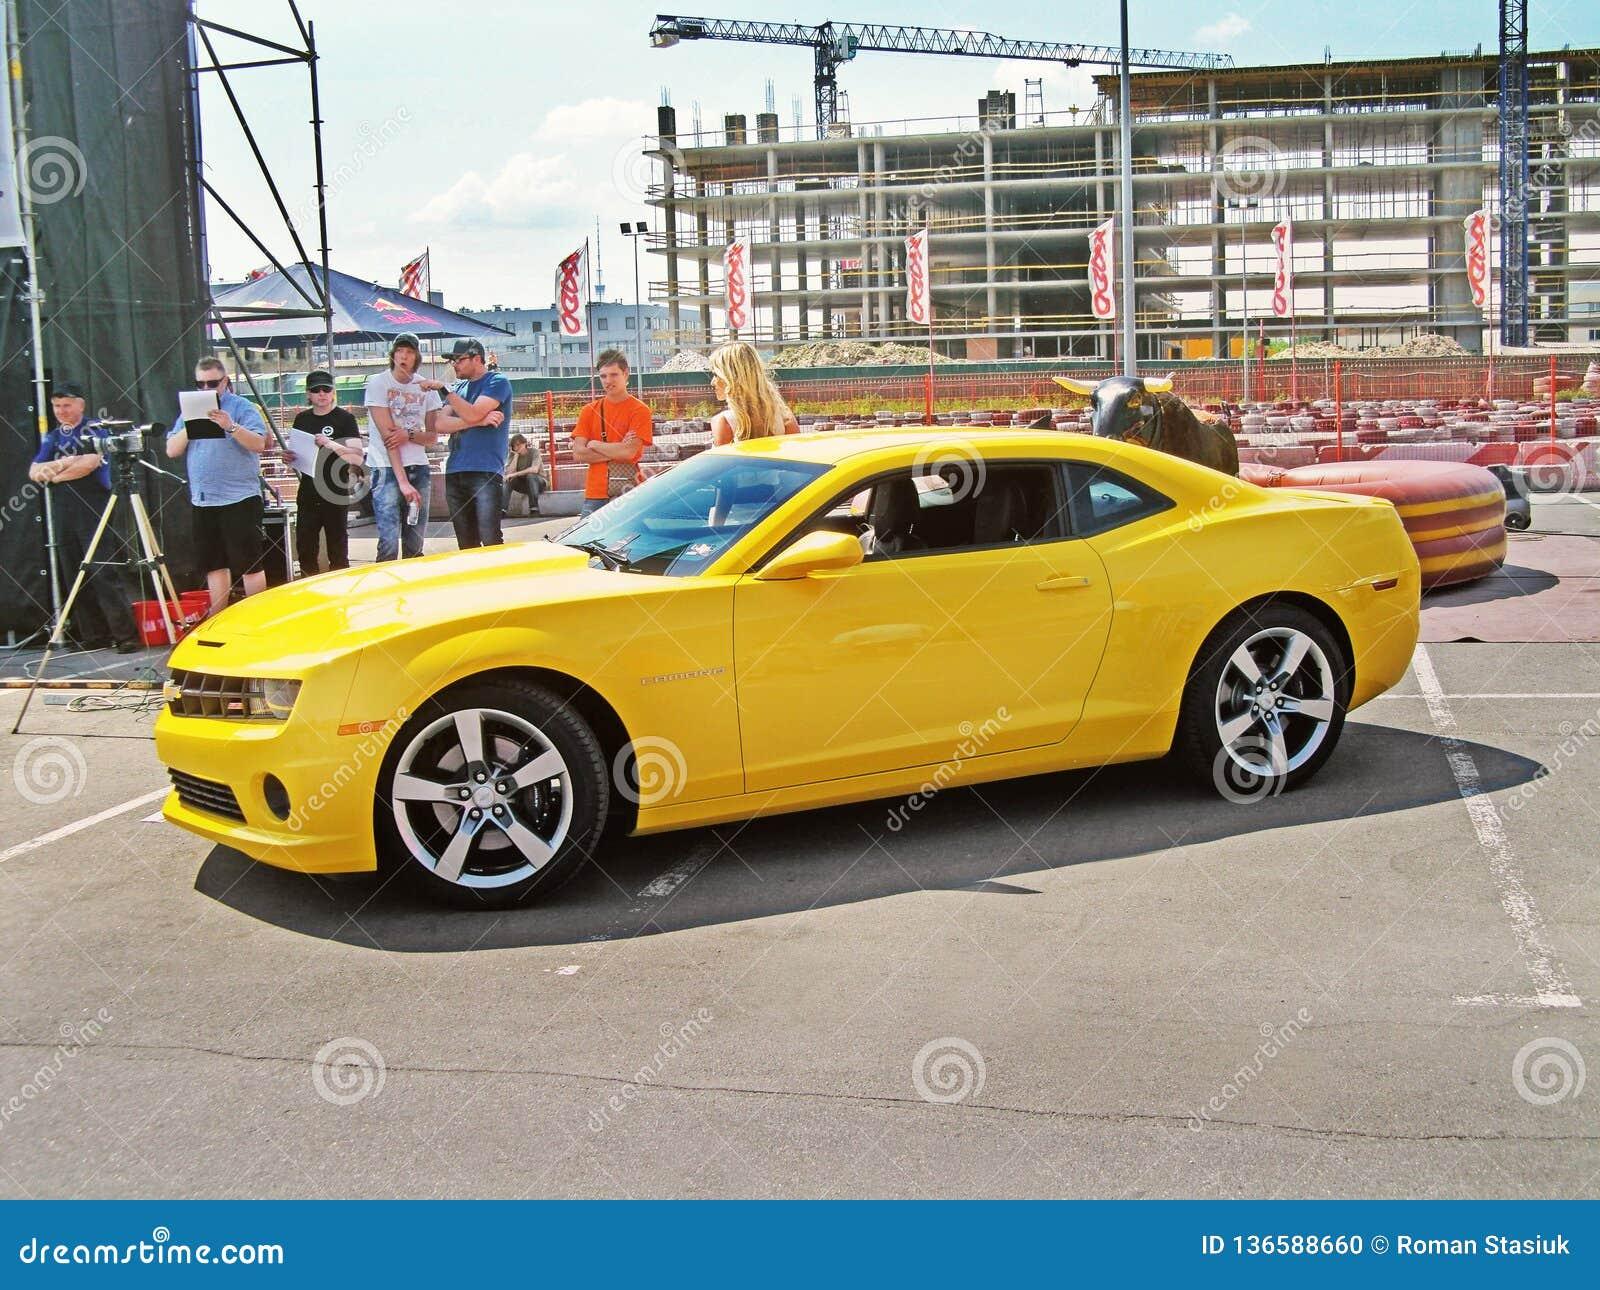 May 21 2011 Kiev Ukraine Chevrolet Camaro Ss In The City Editorial Image Image Of Camaro Detail 136588660